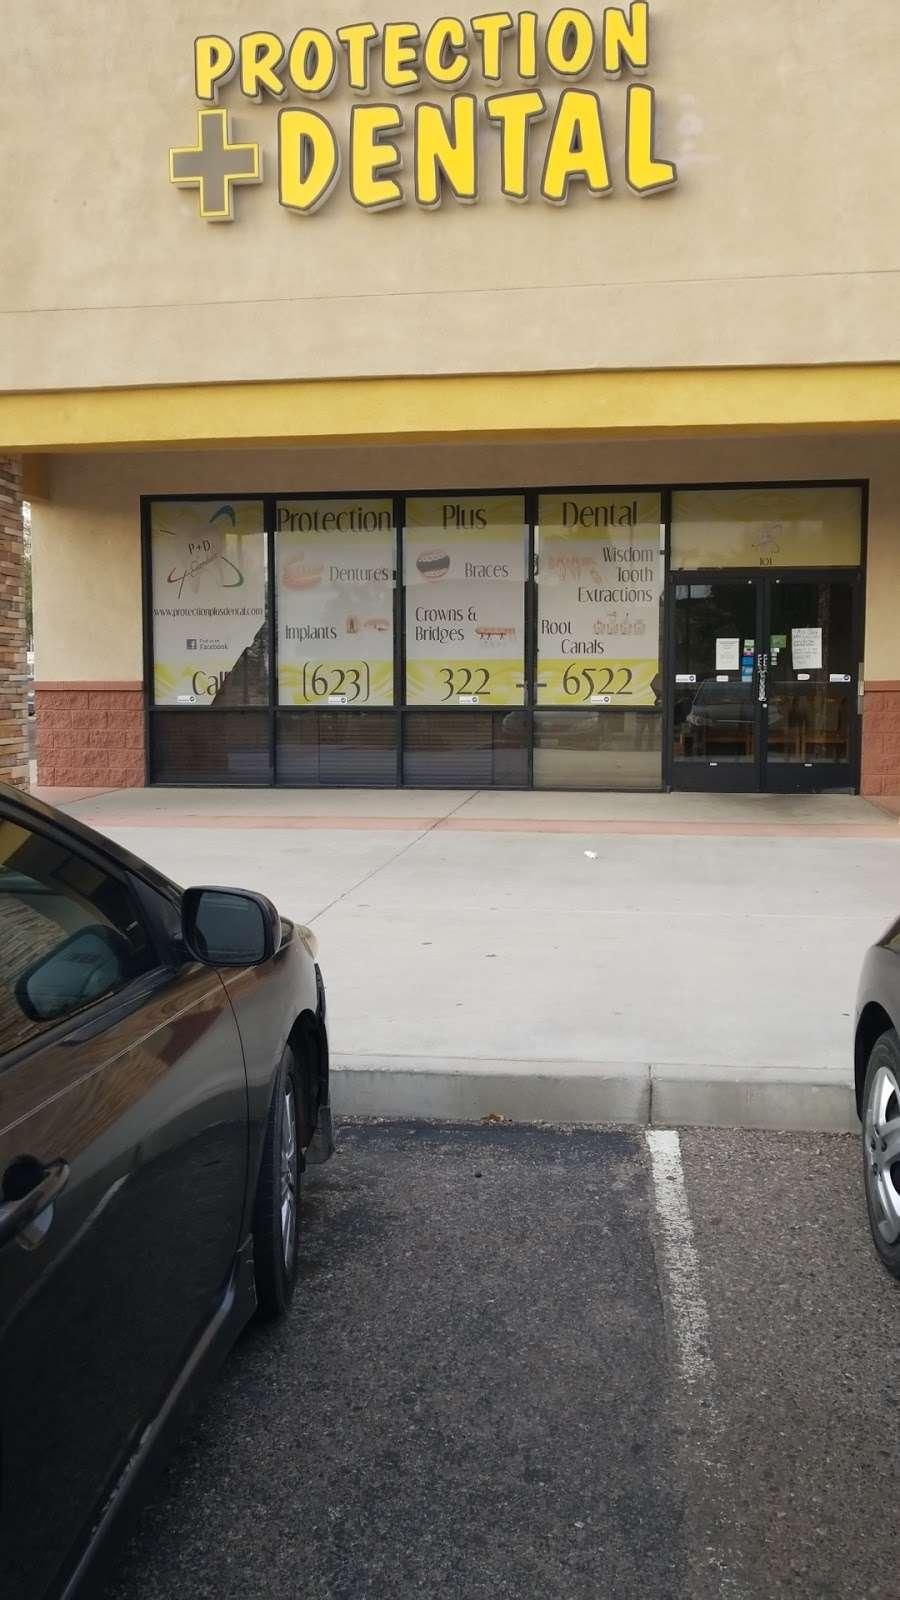 Protection Plus Dental Glendale - dentist  | Photo 5 of 10 | Address: 7025 N 75th Ave #101, Glendale, AZ 85303, USA | Phone: (623) 322-1399